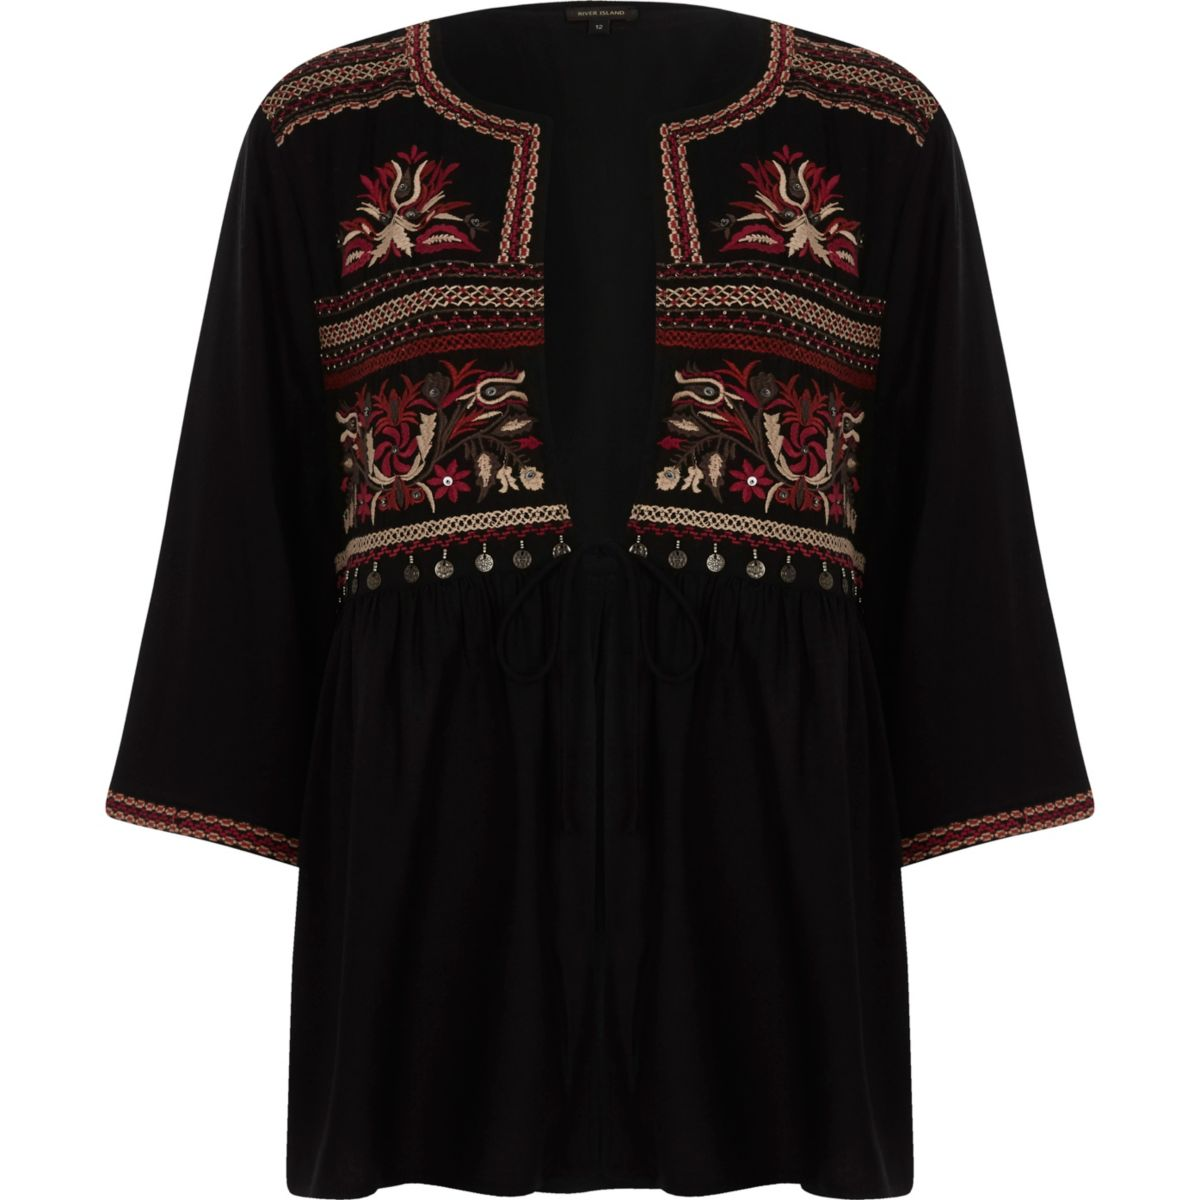 Zwarte kimonotop met strikken en borduursel